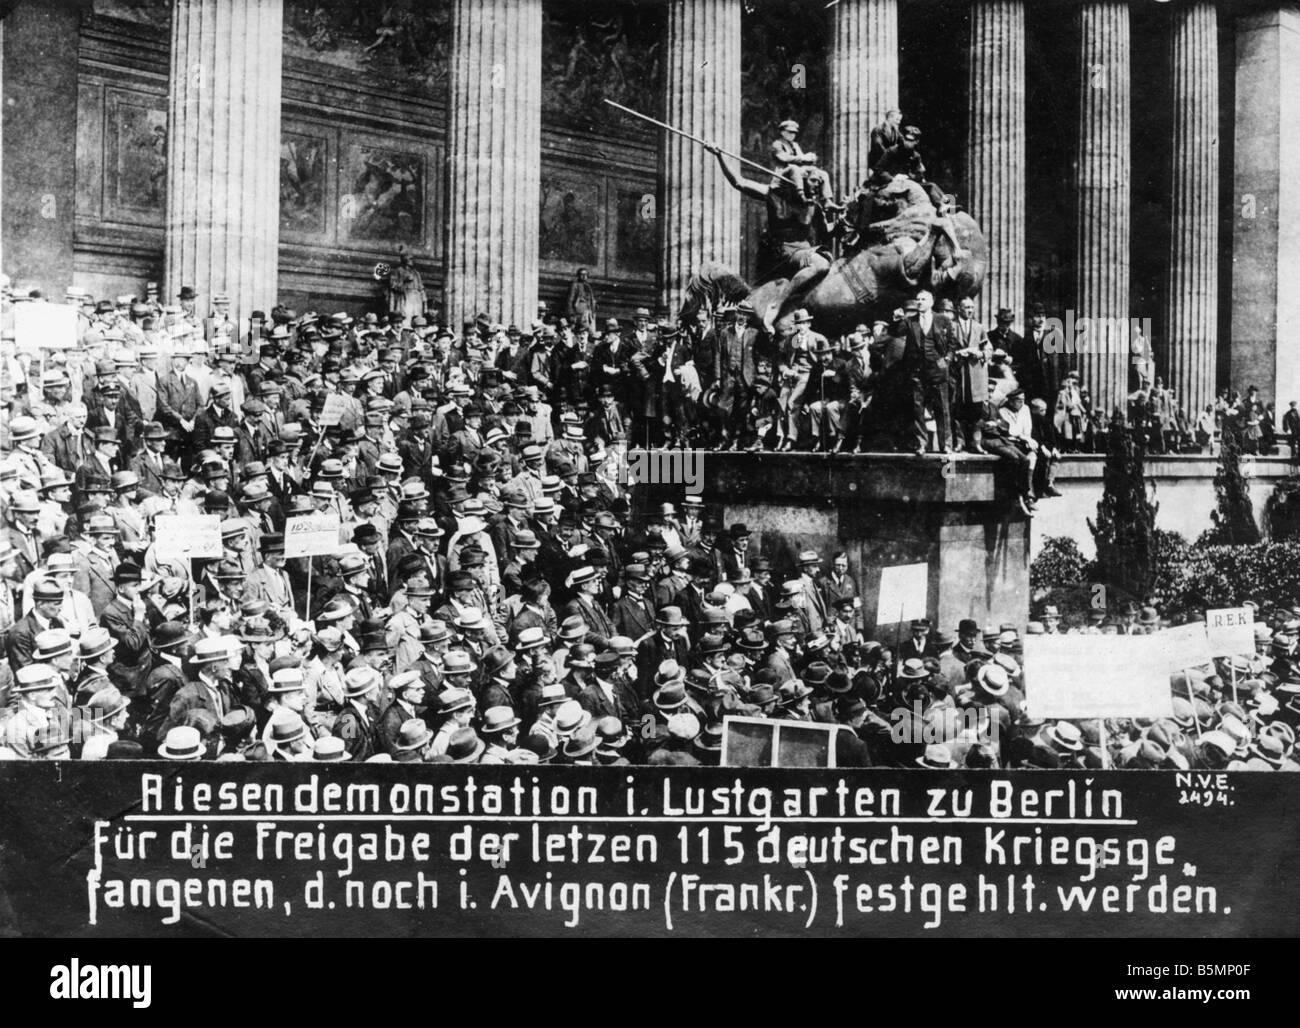 8 1919 0 0 A2 Demonstration for POWs Berlin 1919 End of World War I Berlin 1919 Demonstration in the Lustgarten - Stock Image